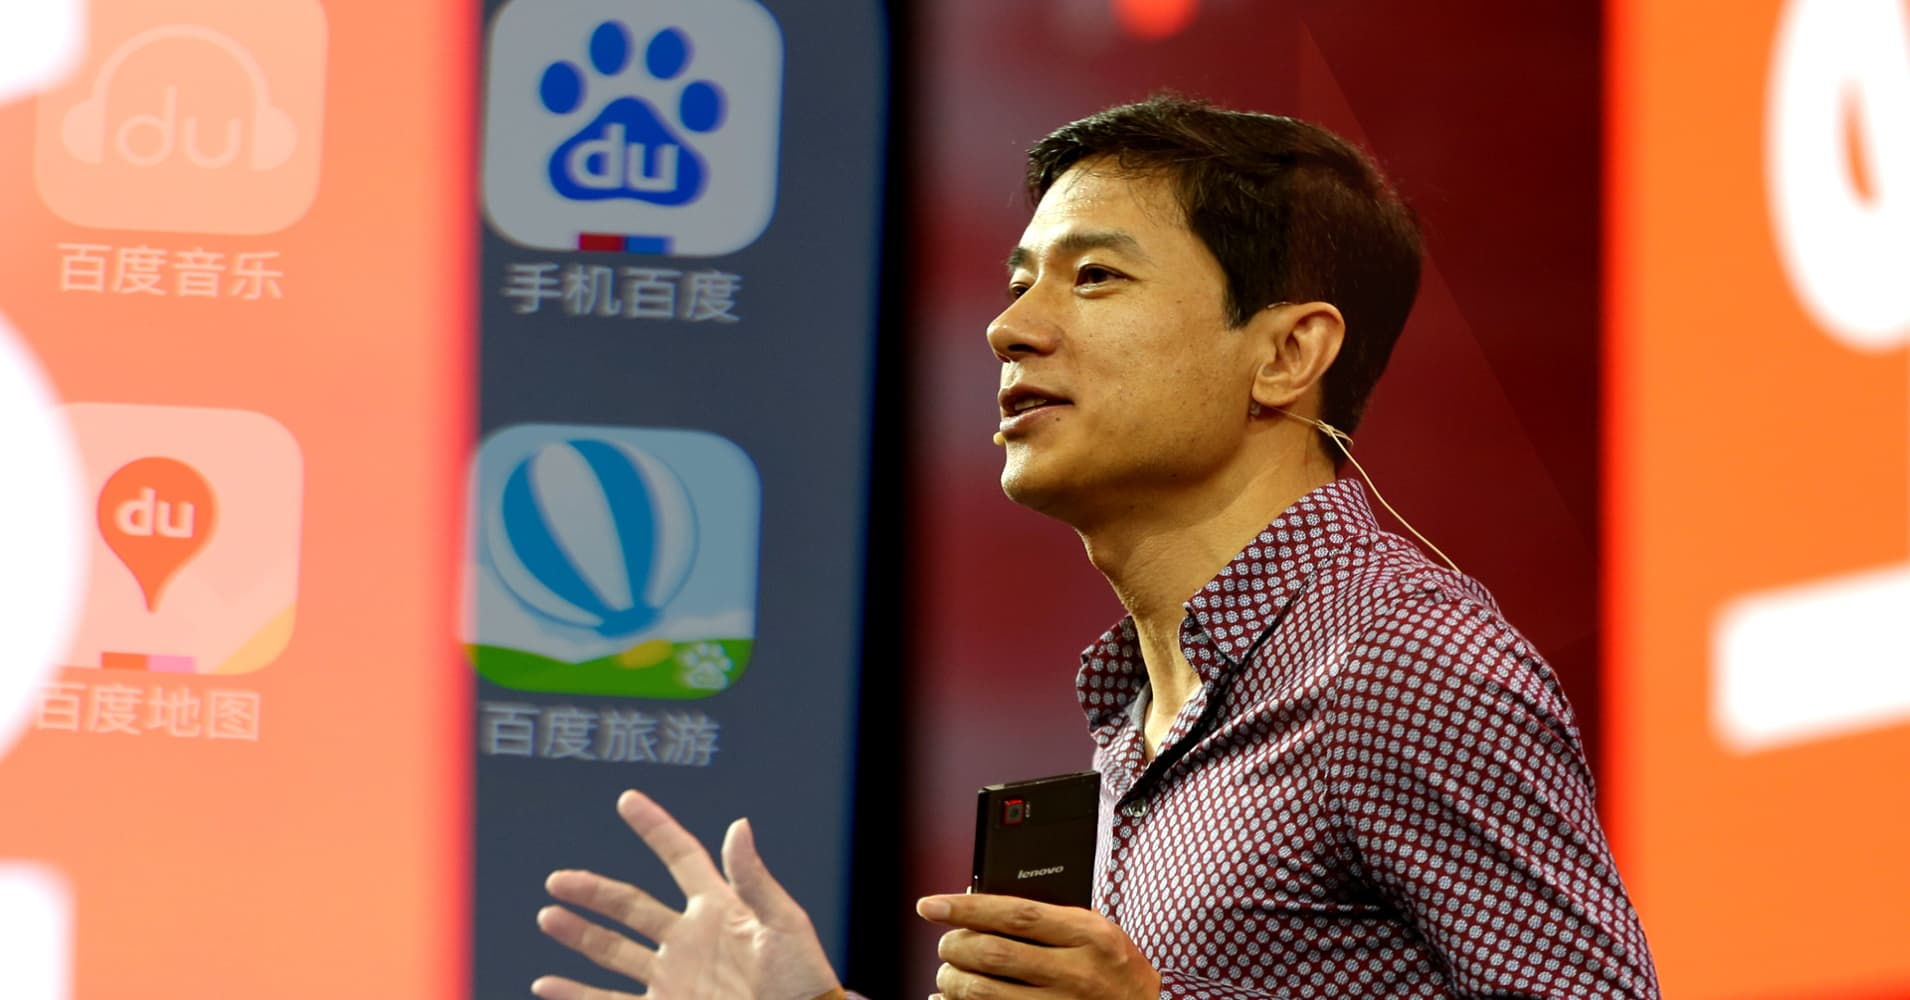 What is Baidu?